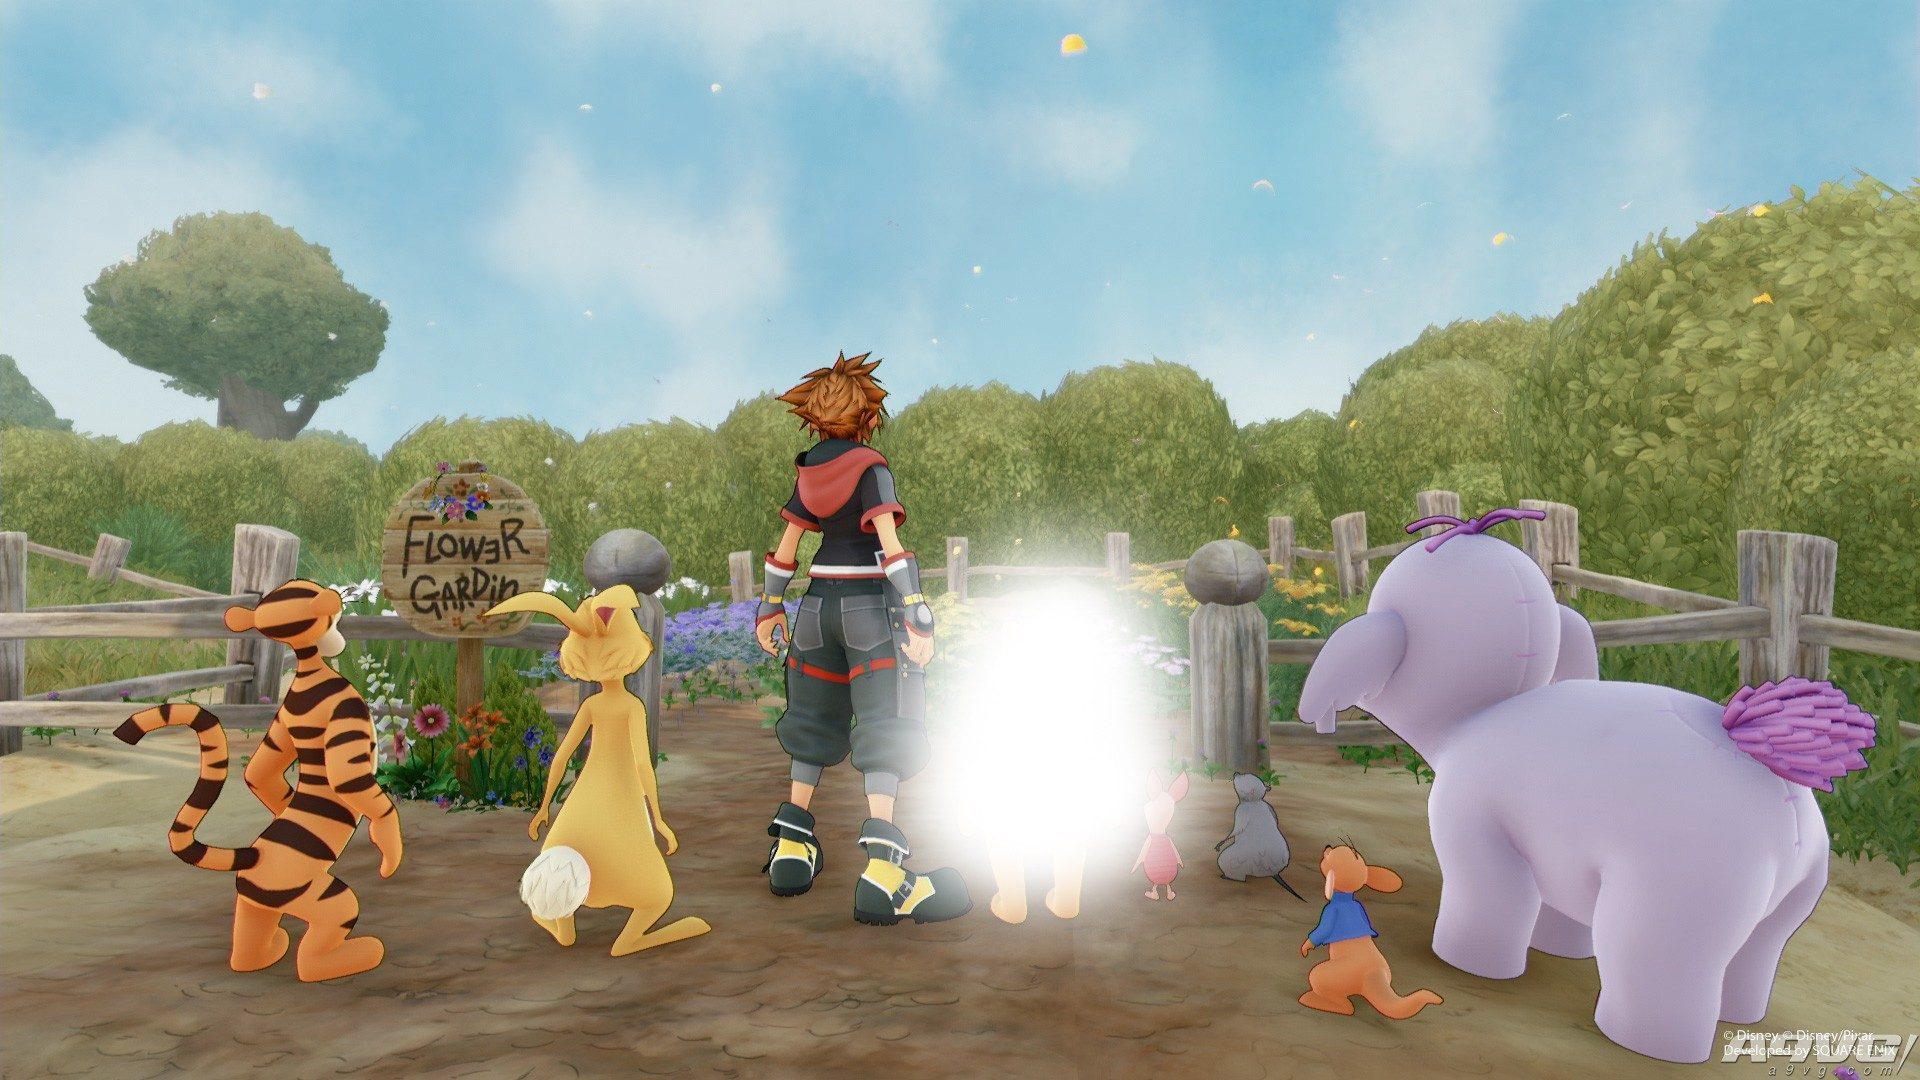 5d6f3eaf43e414a9f19210cf3133486d 1920x1080 - Ursinho Pooh é censurado em versões chinesas de Kingdom Hearts III